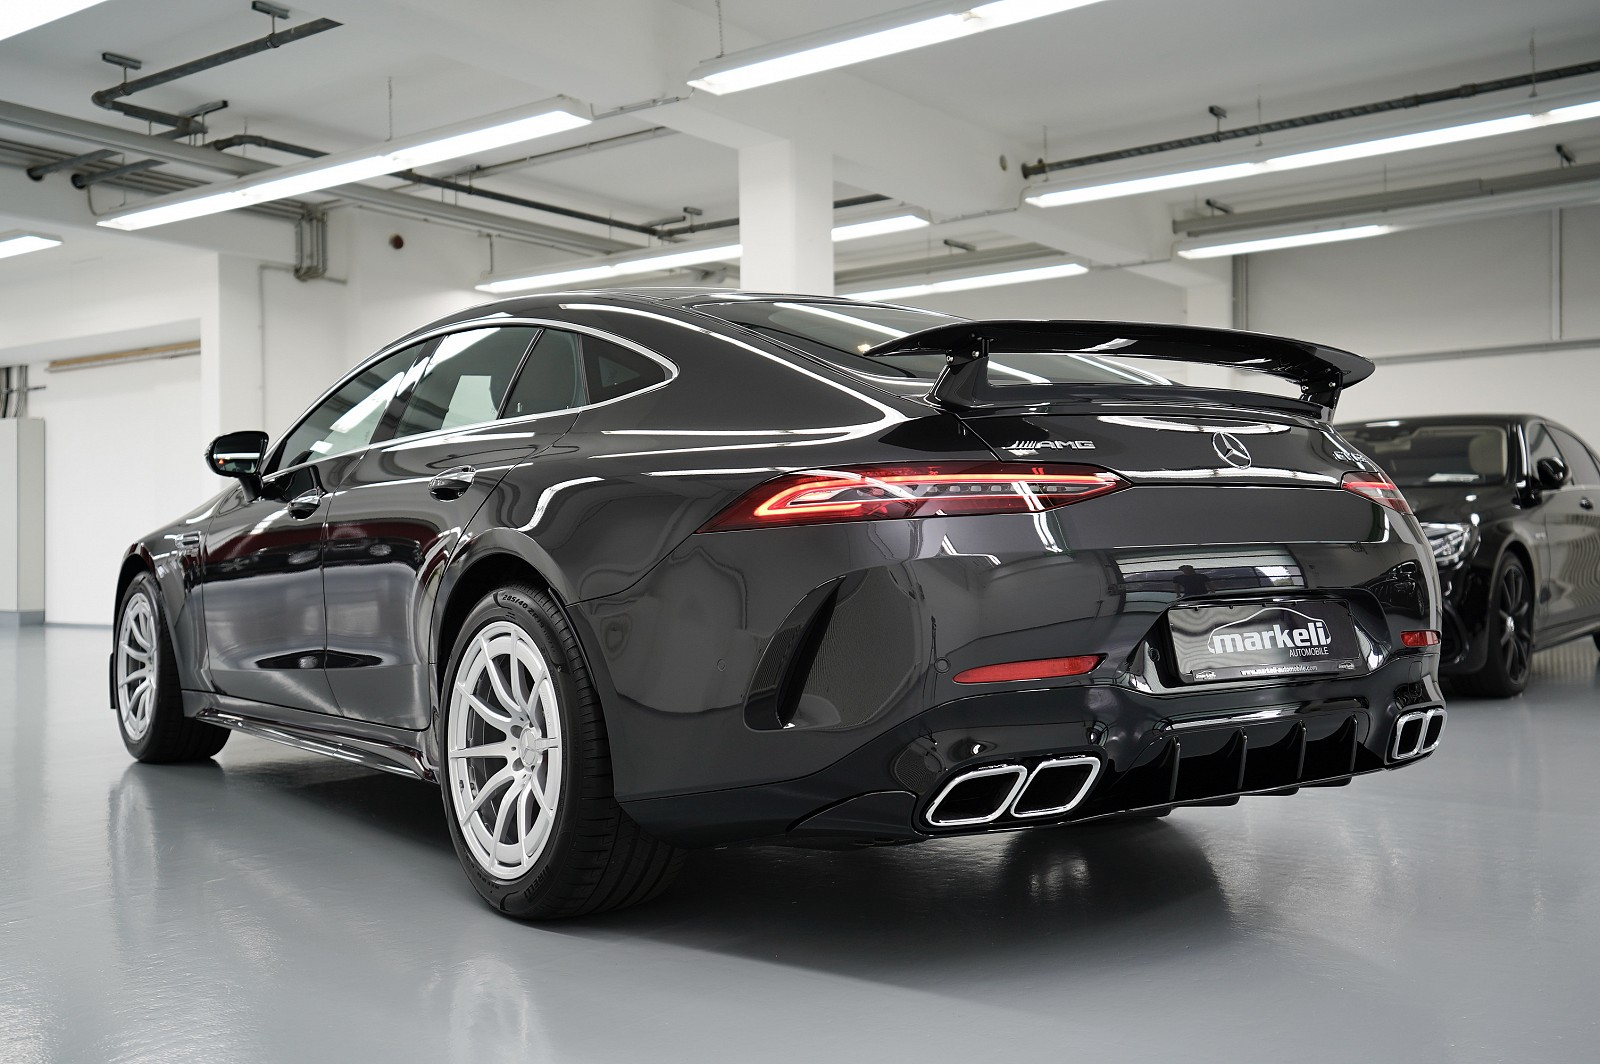 mercedes-amg gt 63 4matic+ !Modell 2021! !!! M.2021- km 4.400 !!! AMG AERODYNAMIK & CARBON PAKET !!!